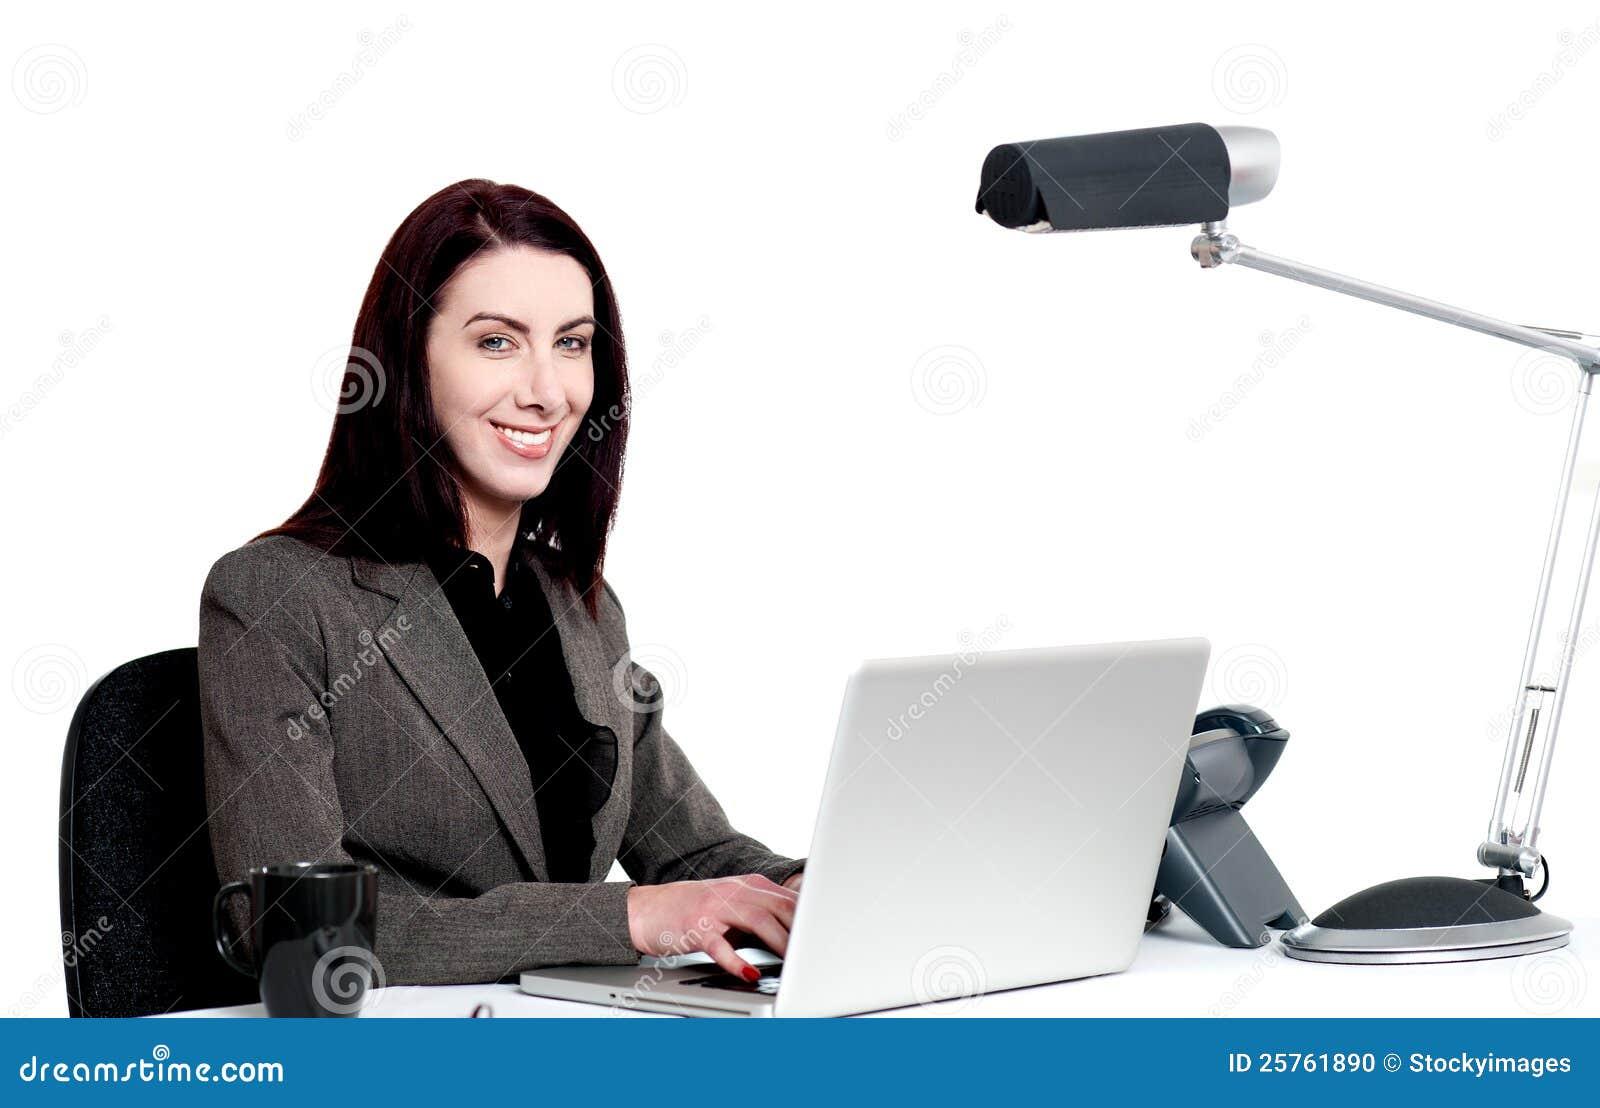 professional corporate lady at work indoor shot stock photo professional corporate lady at work indoor shot